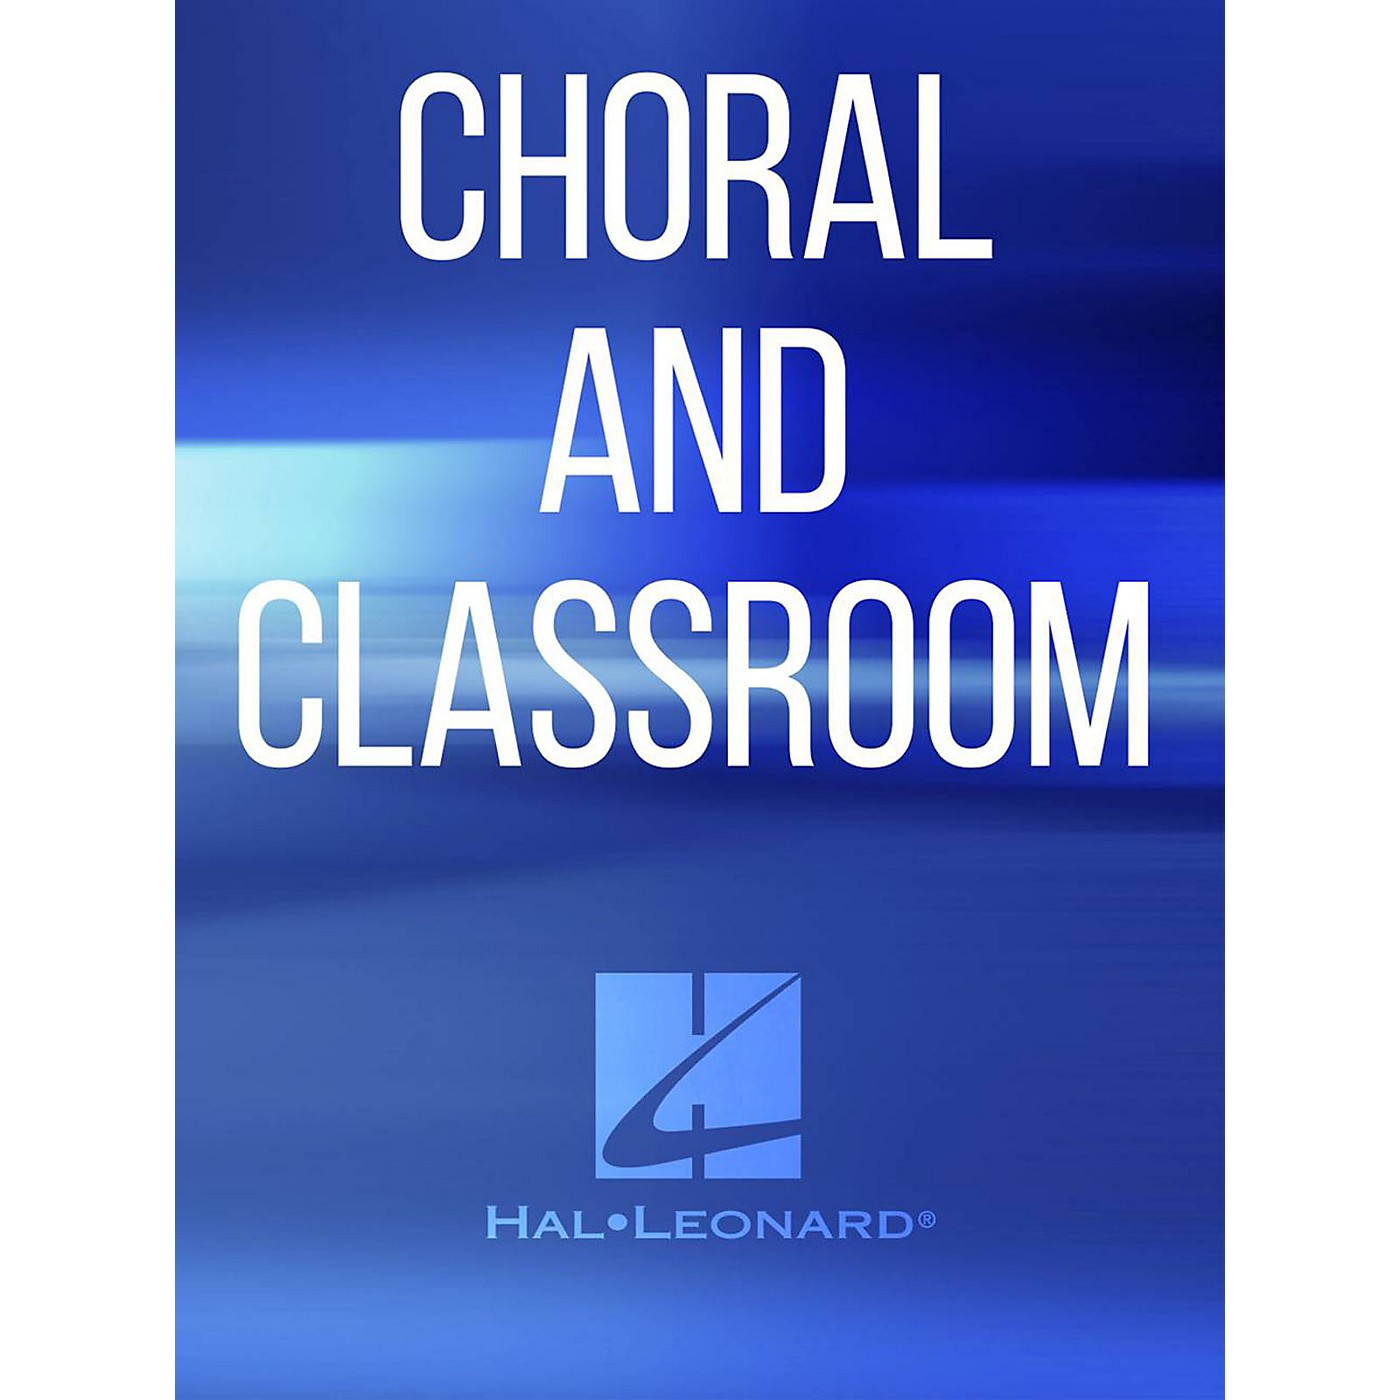 Hal Leonard Da Bei Rami Scendea SATB Composed by Arcadelt Ja thumbnail